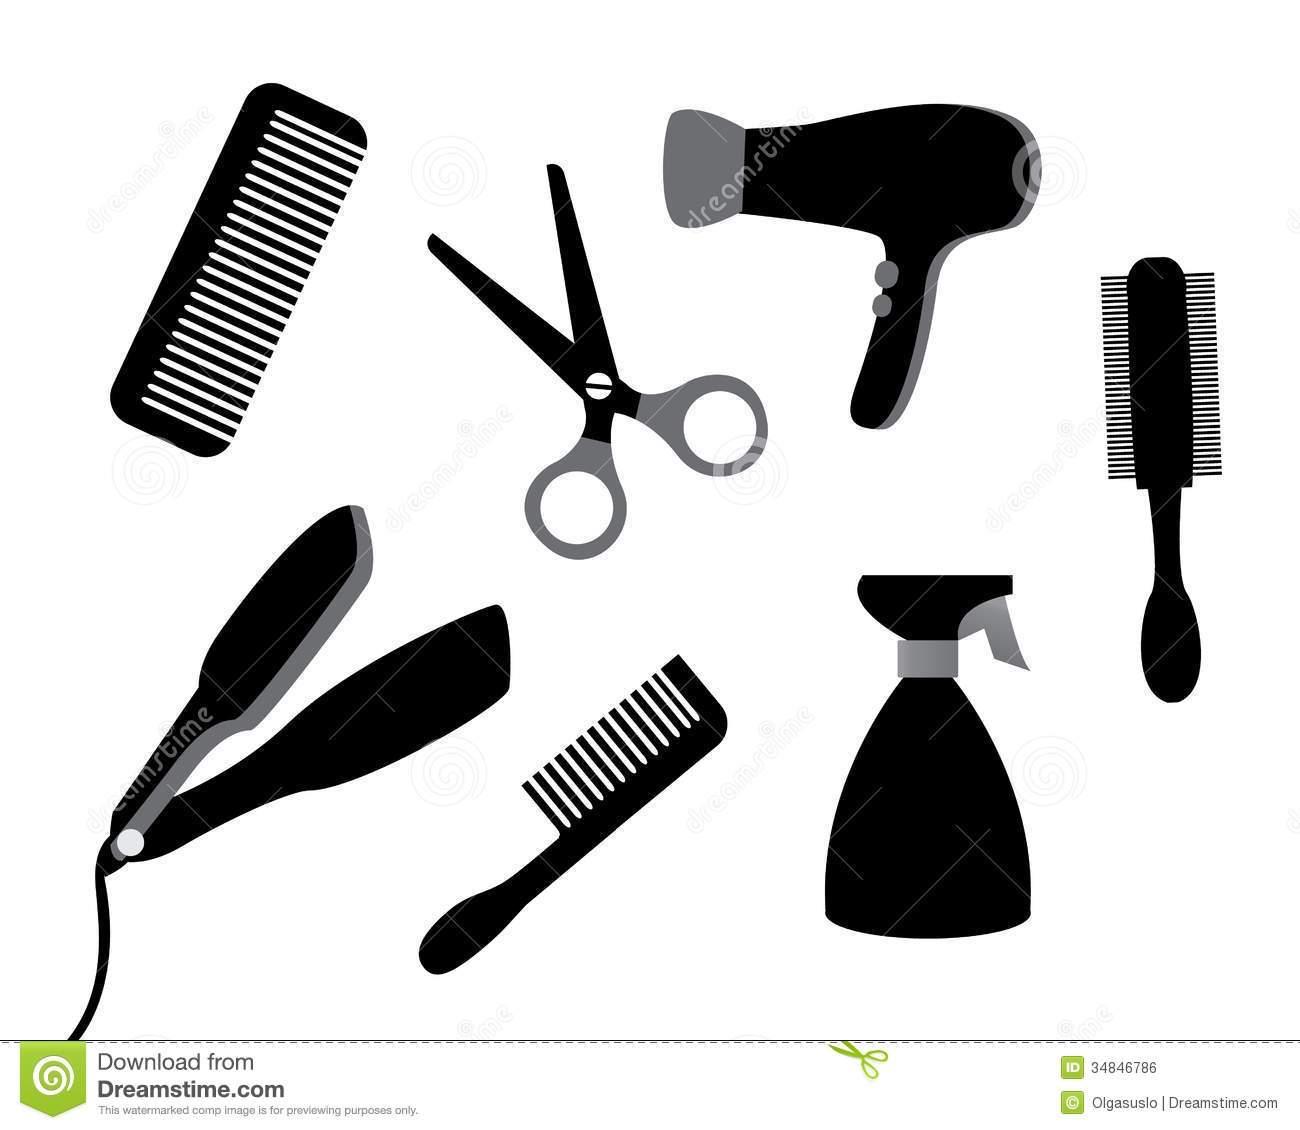 Hair tools clipart 6 » Clipart Portal.